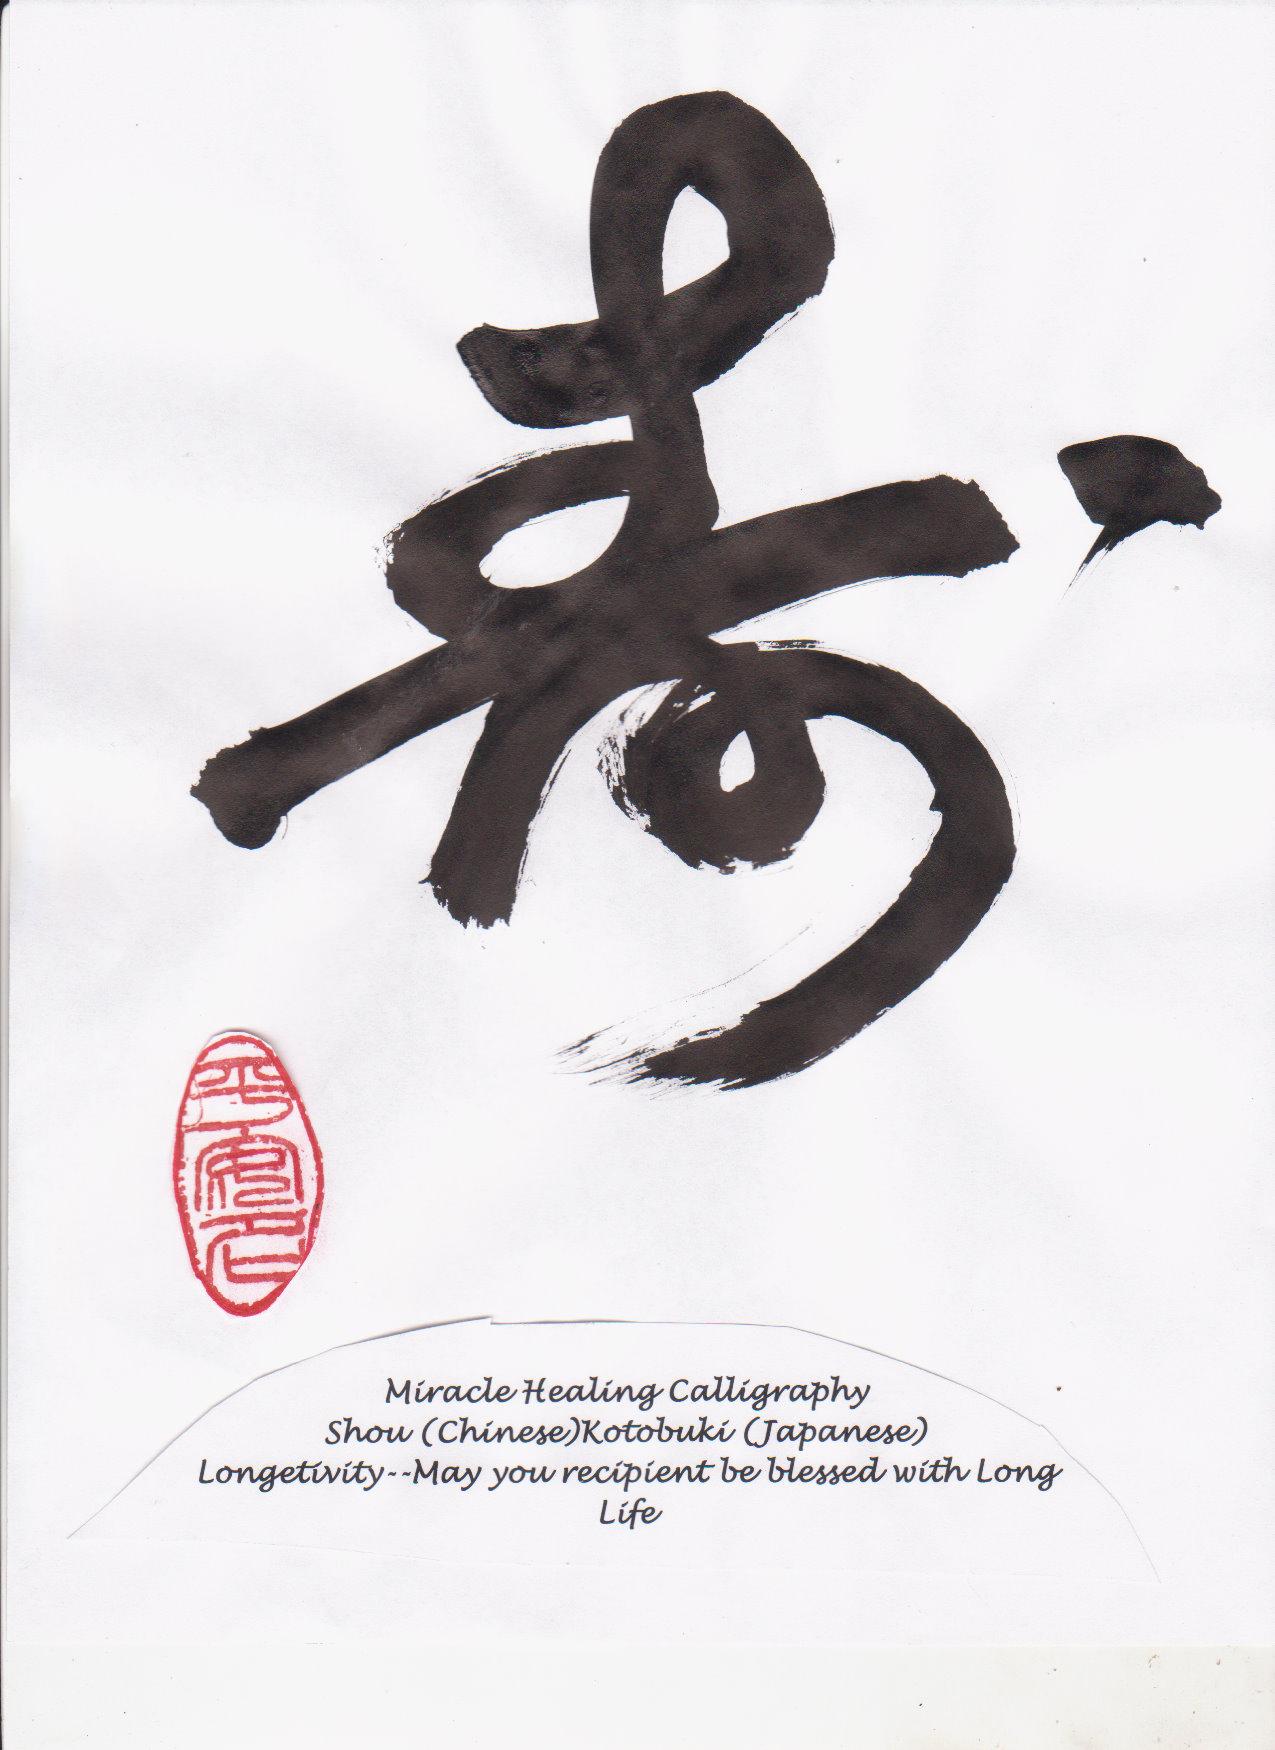 Miracle Healing Calligraphy Long Life Japanese Kotobuki